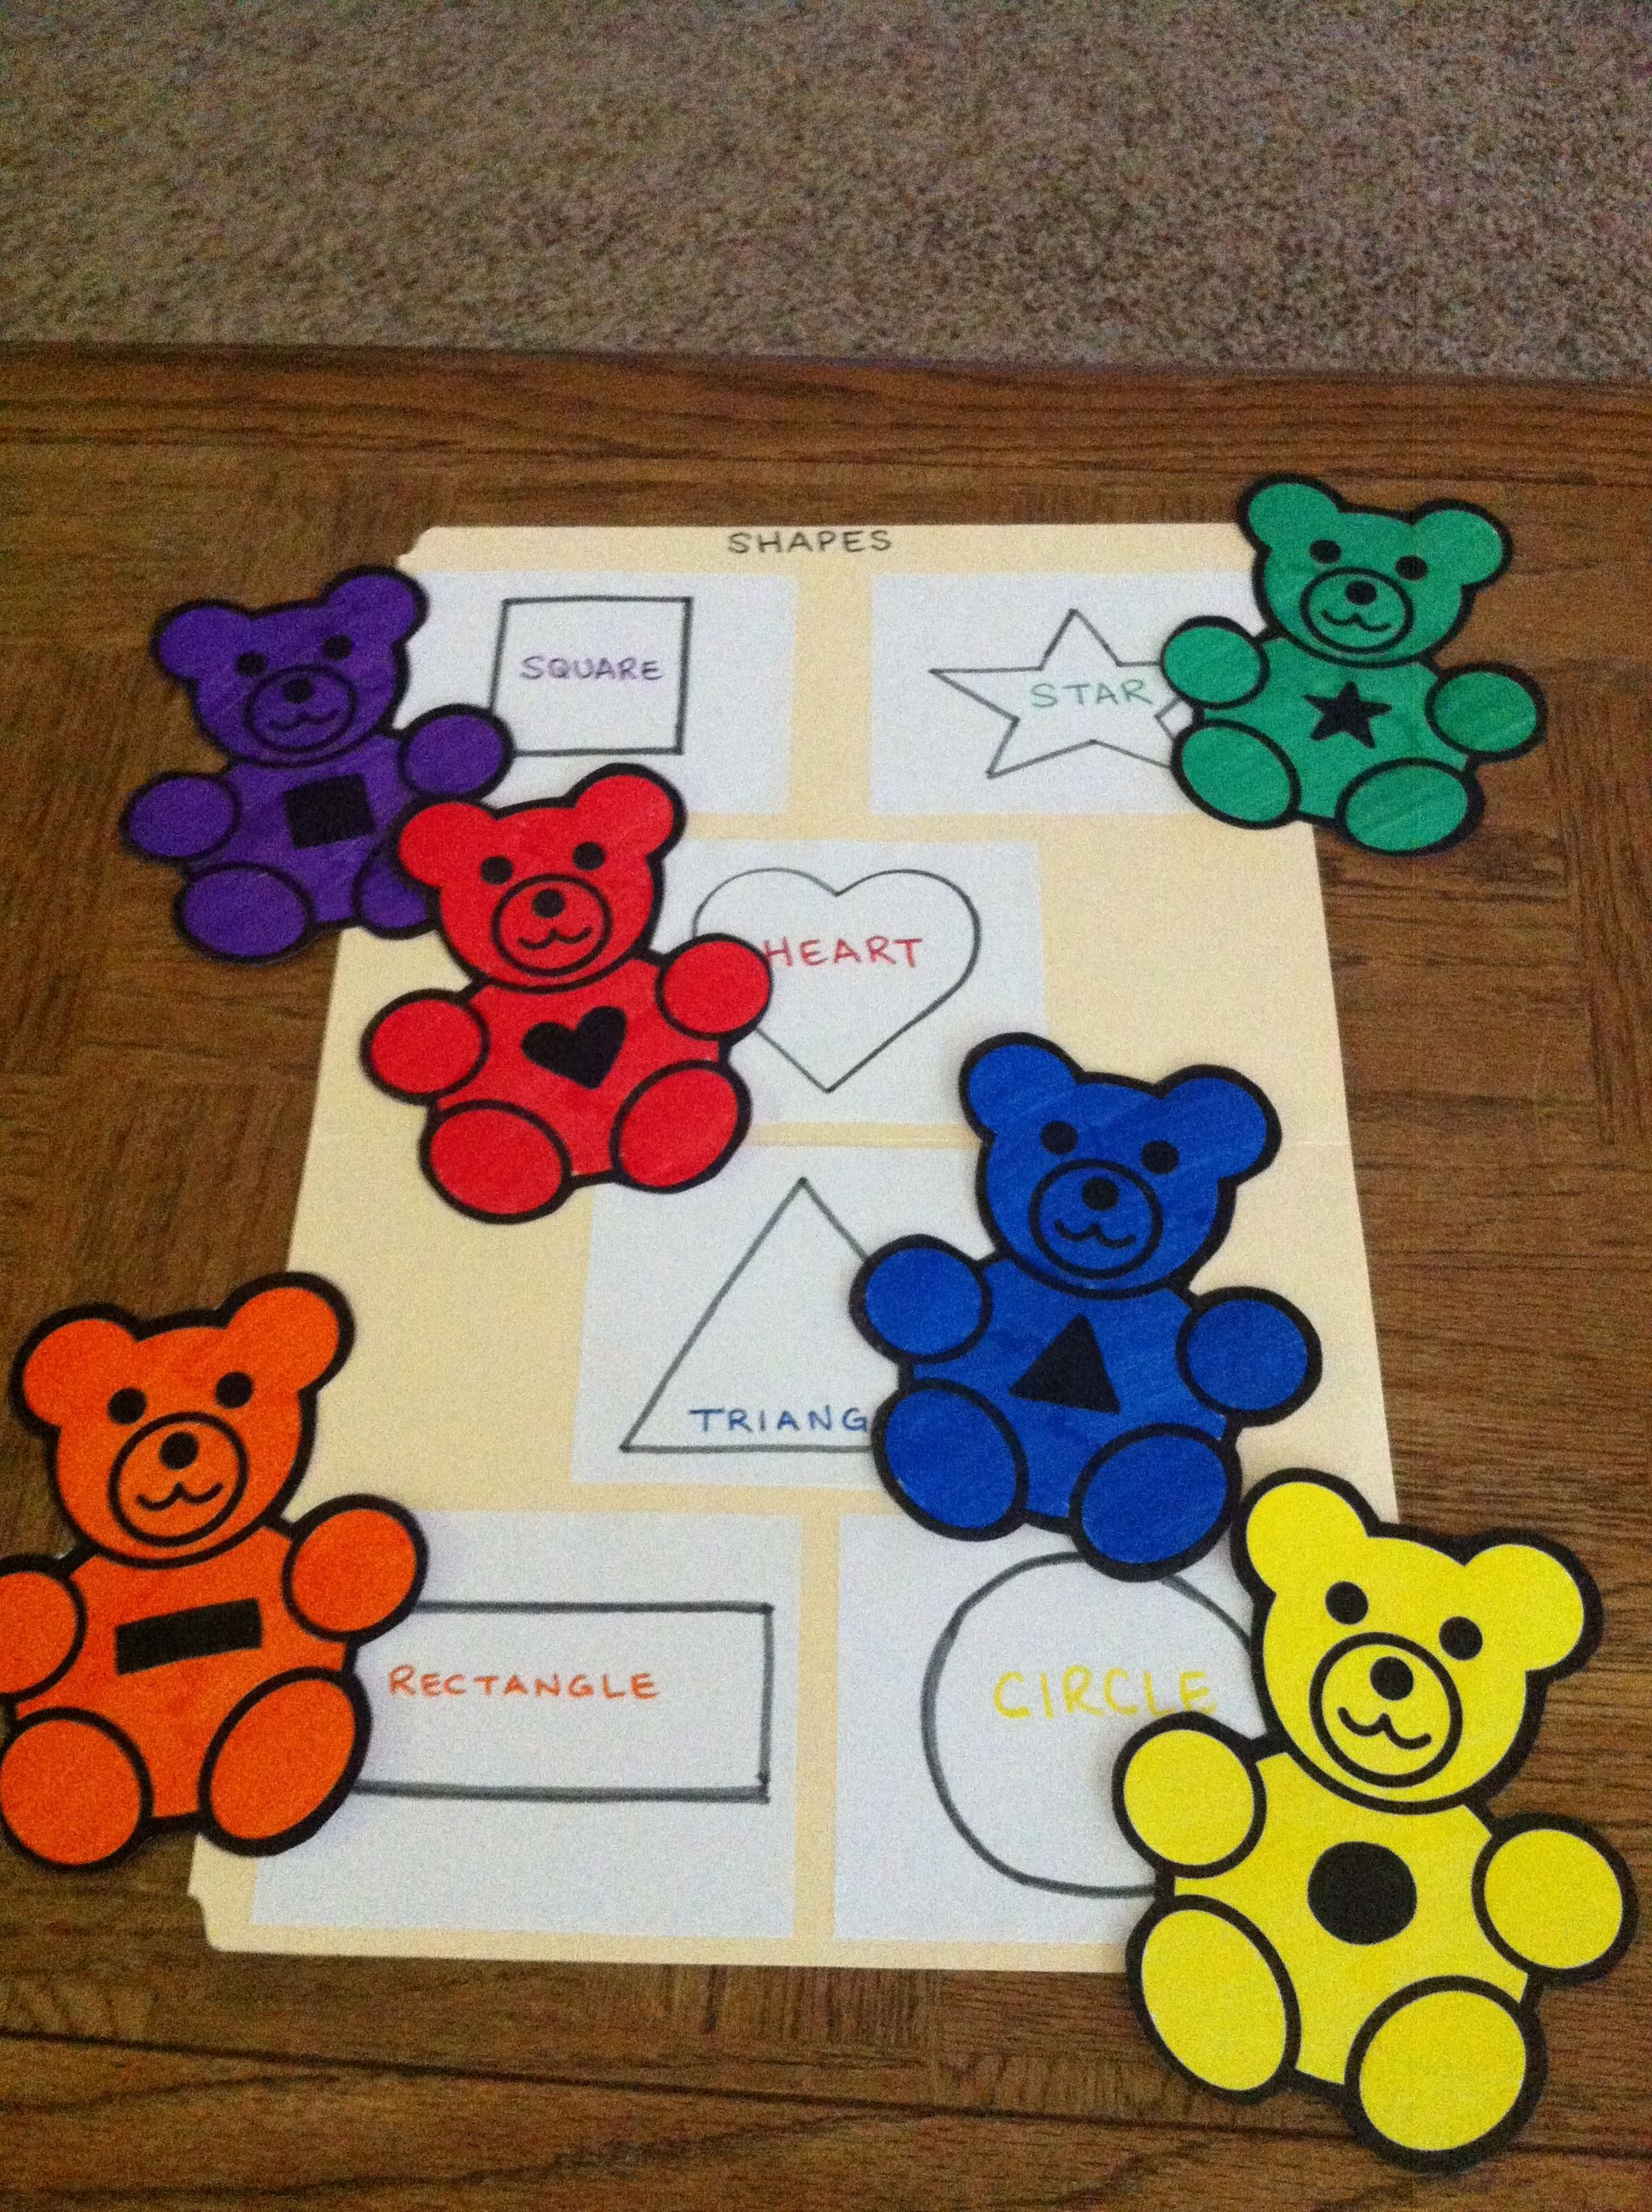 File Folder Game For Preschoolers-- Shape Matching | Teaching - Free Printable Math File Folder Games For Preschoolers